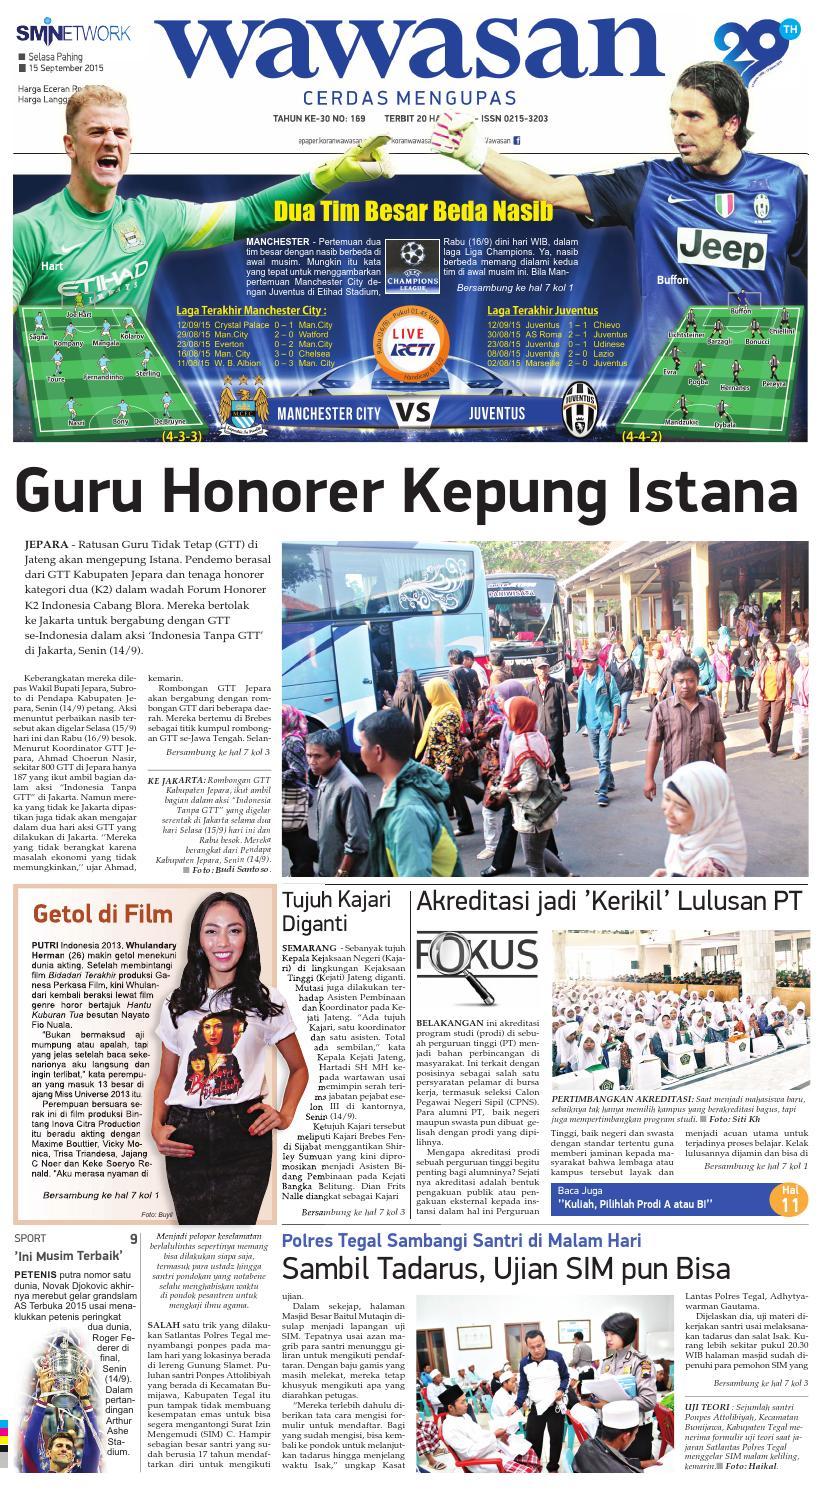 Wawasan 15 September 2015 By Koran Pagi Issuu Produk Ukm Bumn Batik Lengan Panjang Parang Toko Ngremboko